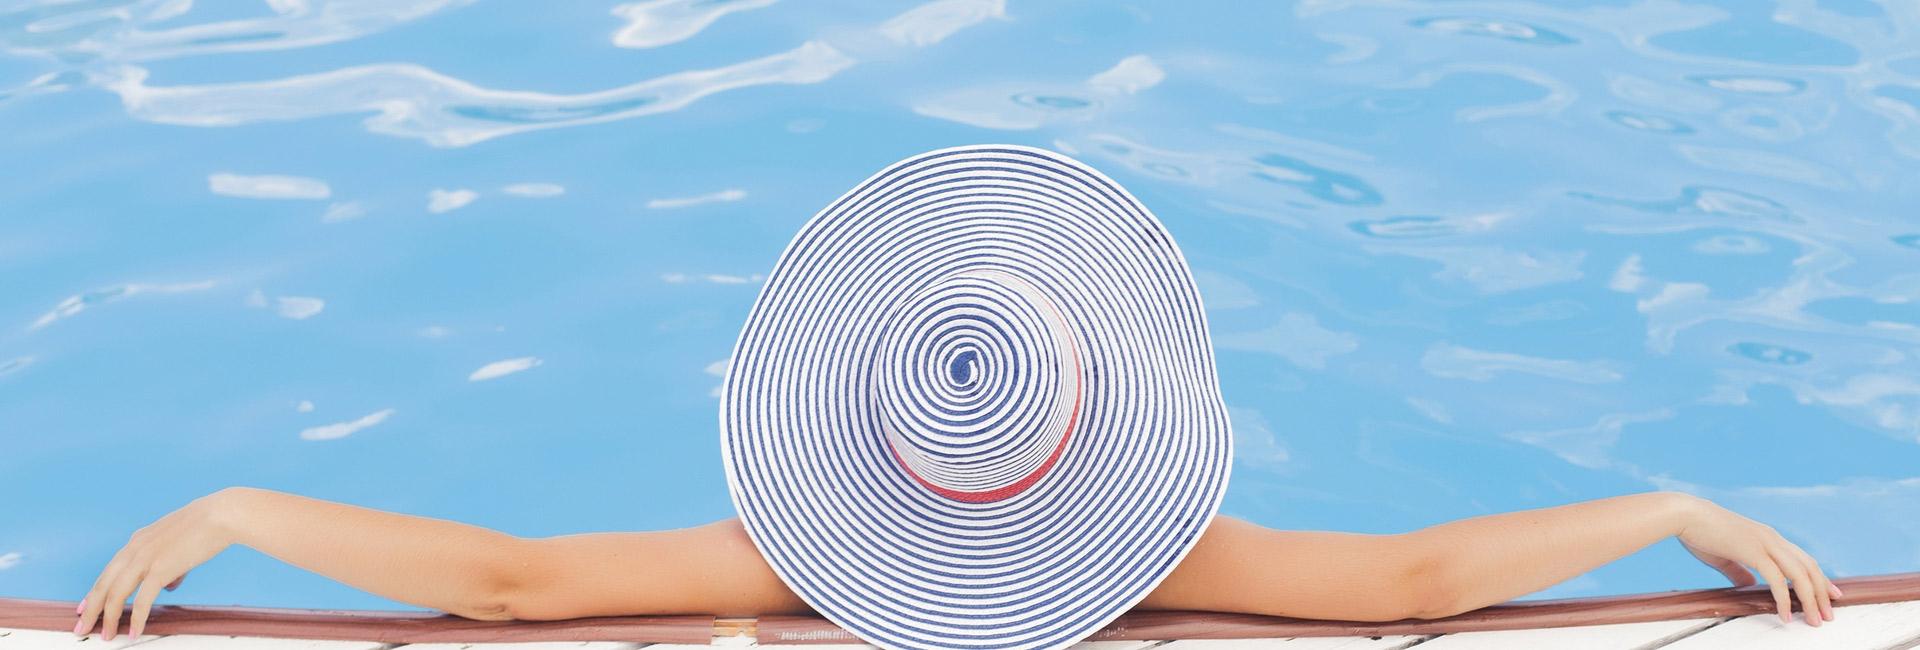 inground-swimming-pool-lady-in-hat